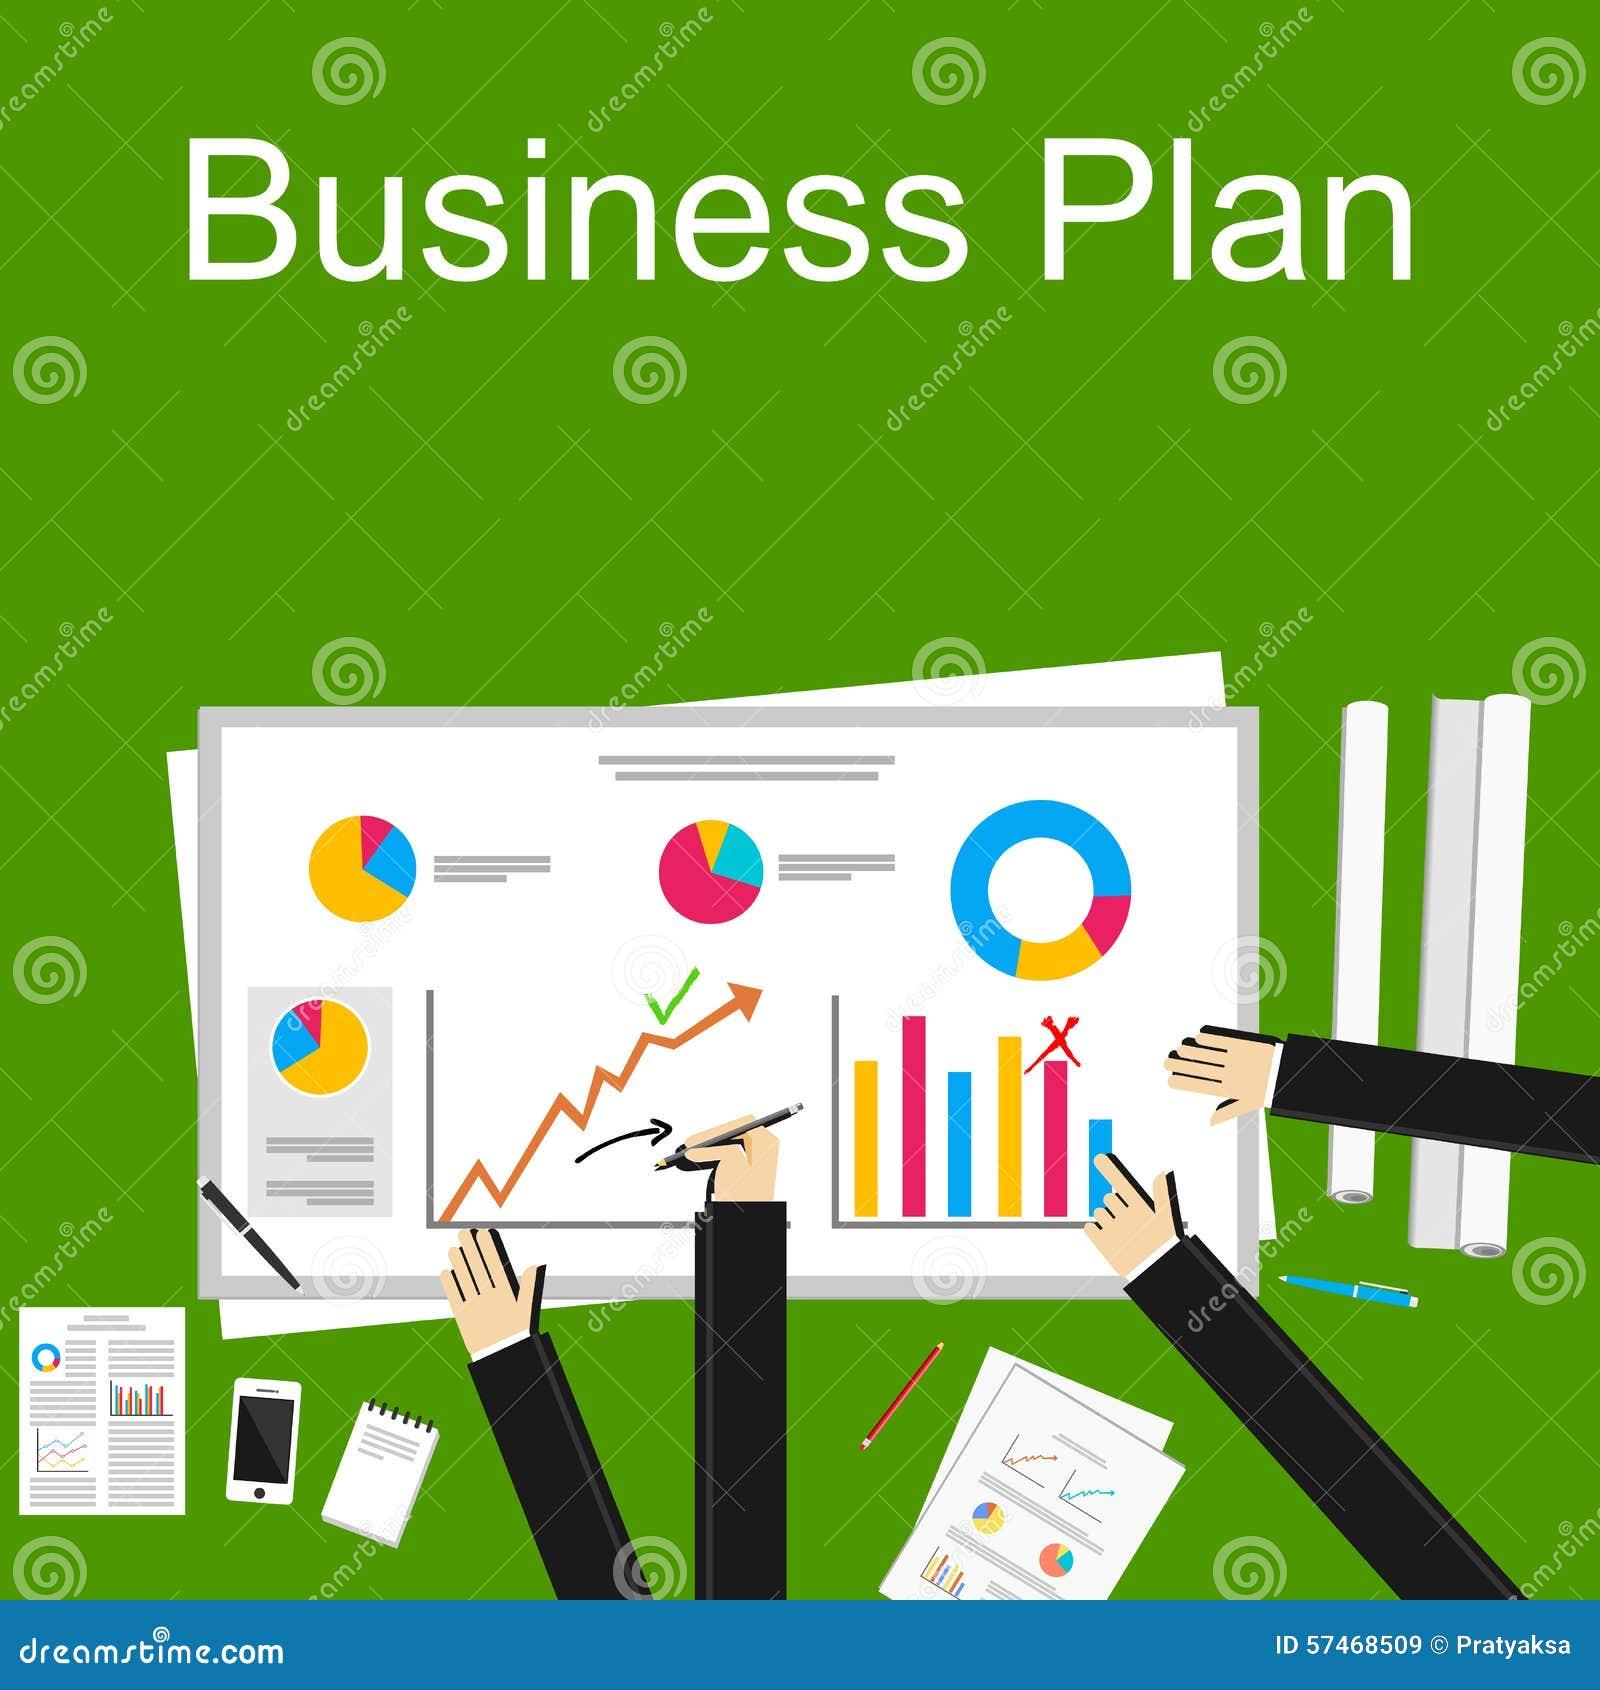 Business plan statistics